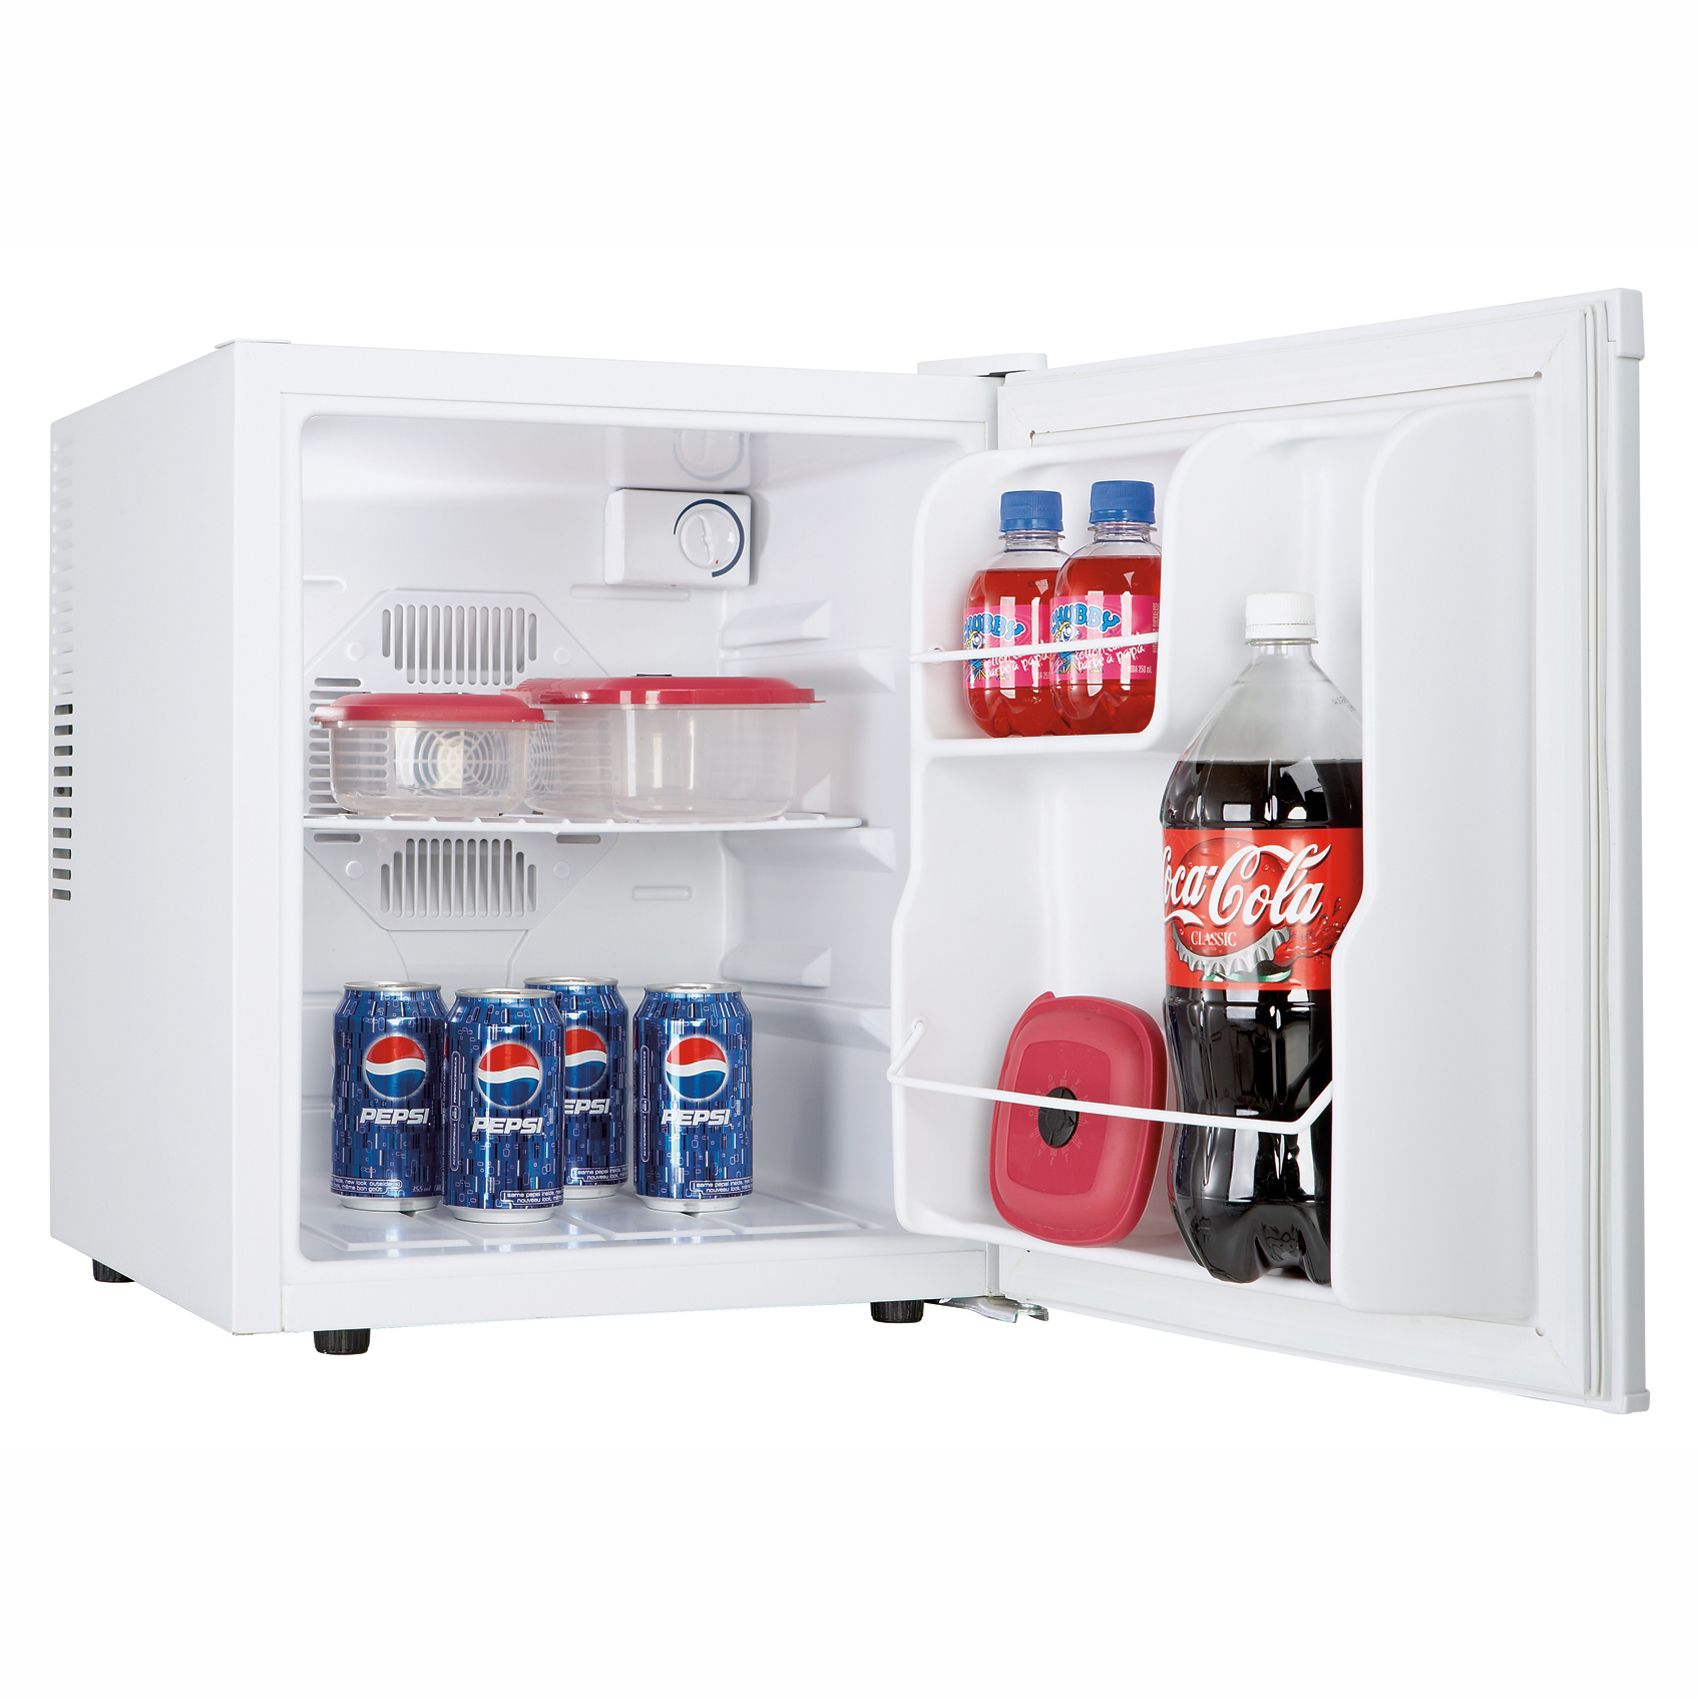 Kenmore 1.7 cu. ft. Compact Refrigerator